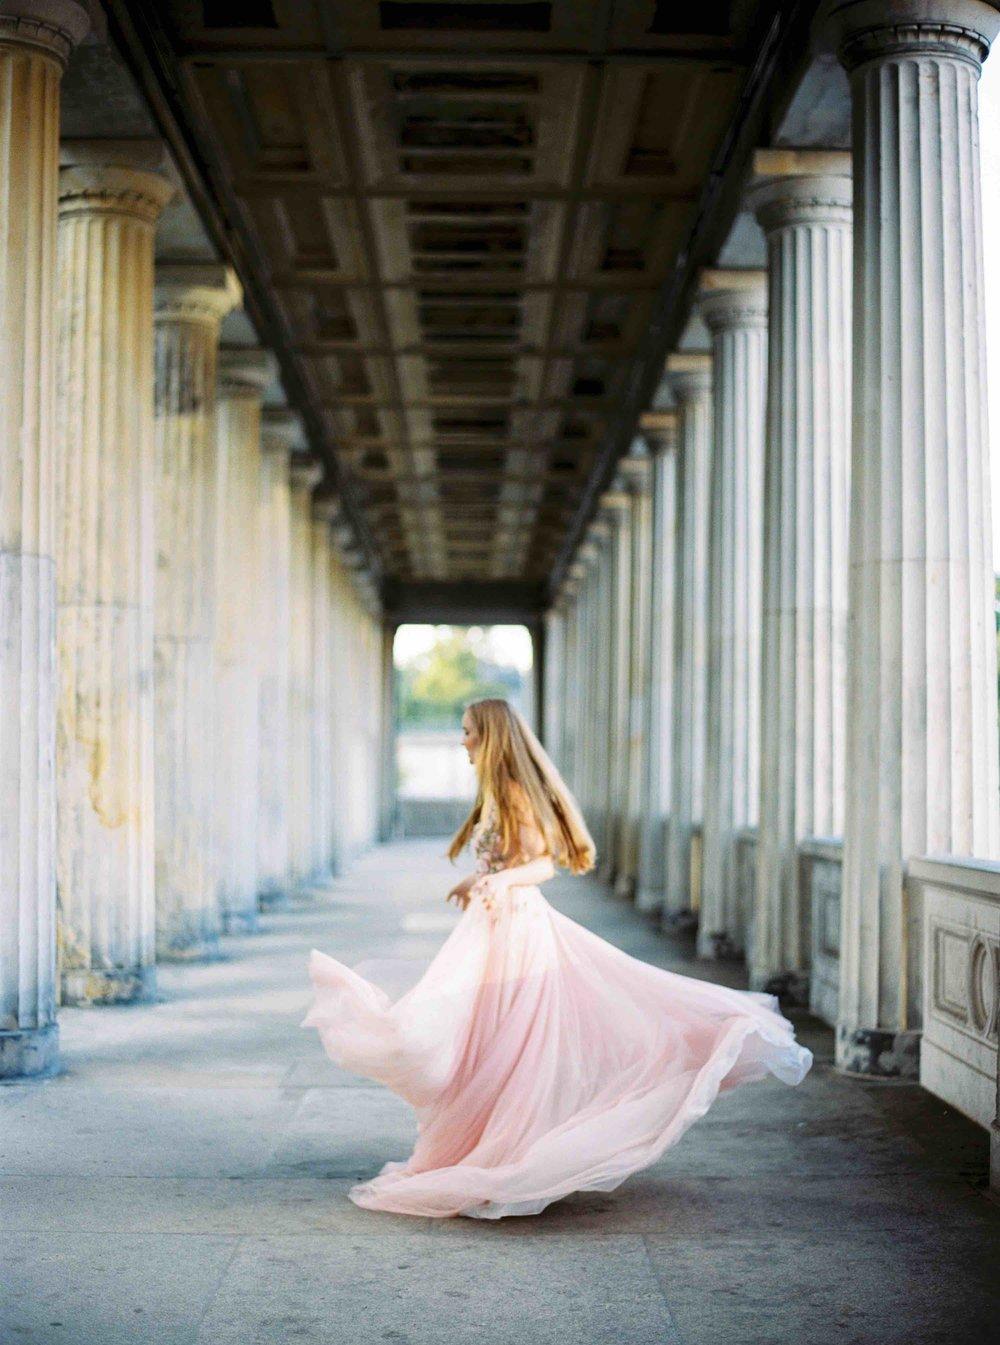 MarryMeBureau-MarinaBaum-Festtagsfotografien_BeretKah-Collection2016-18.jpg